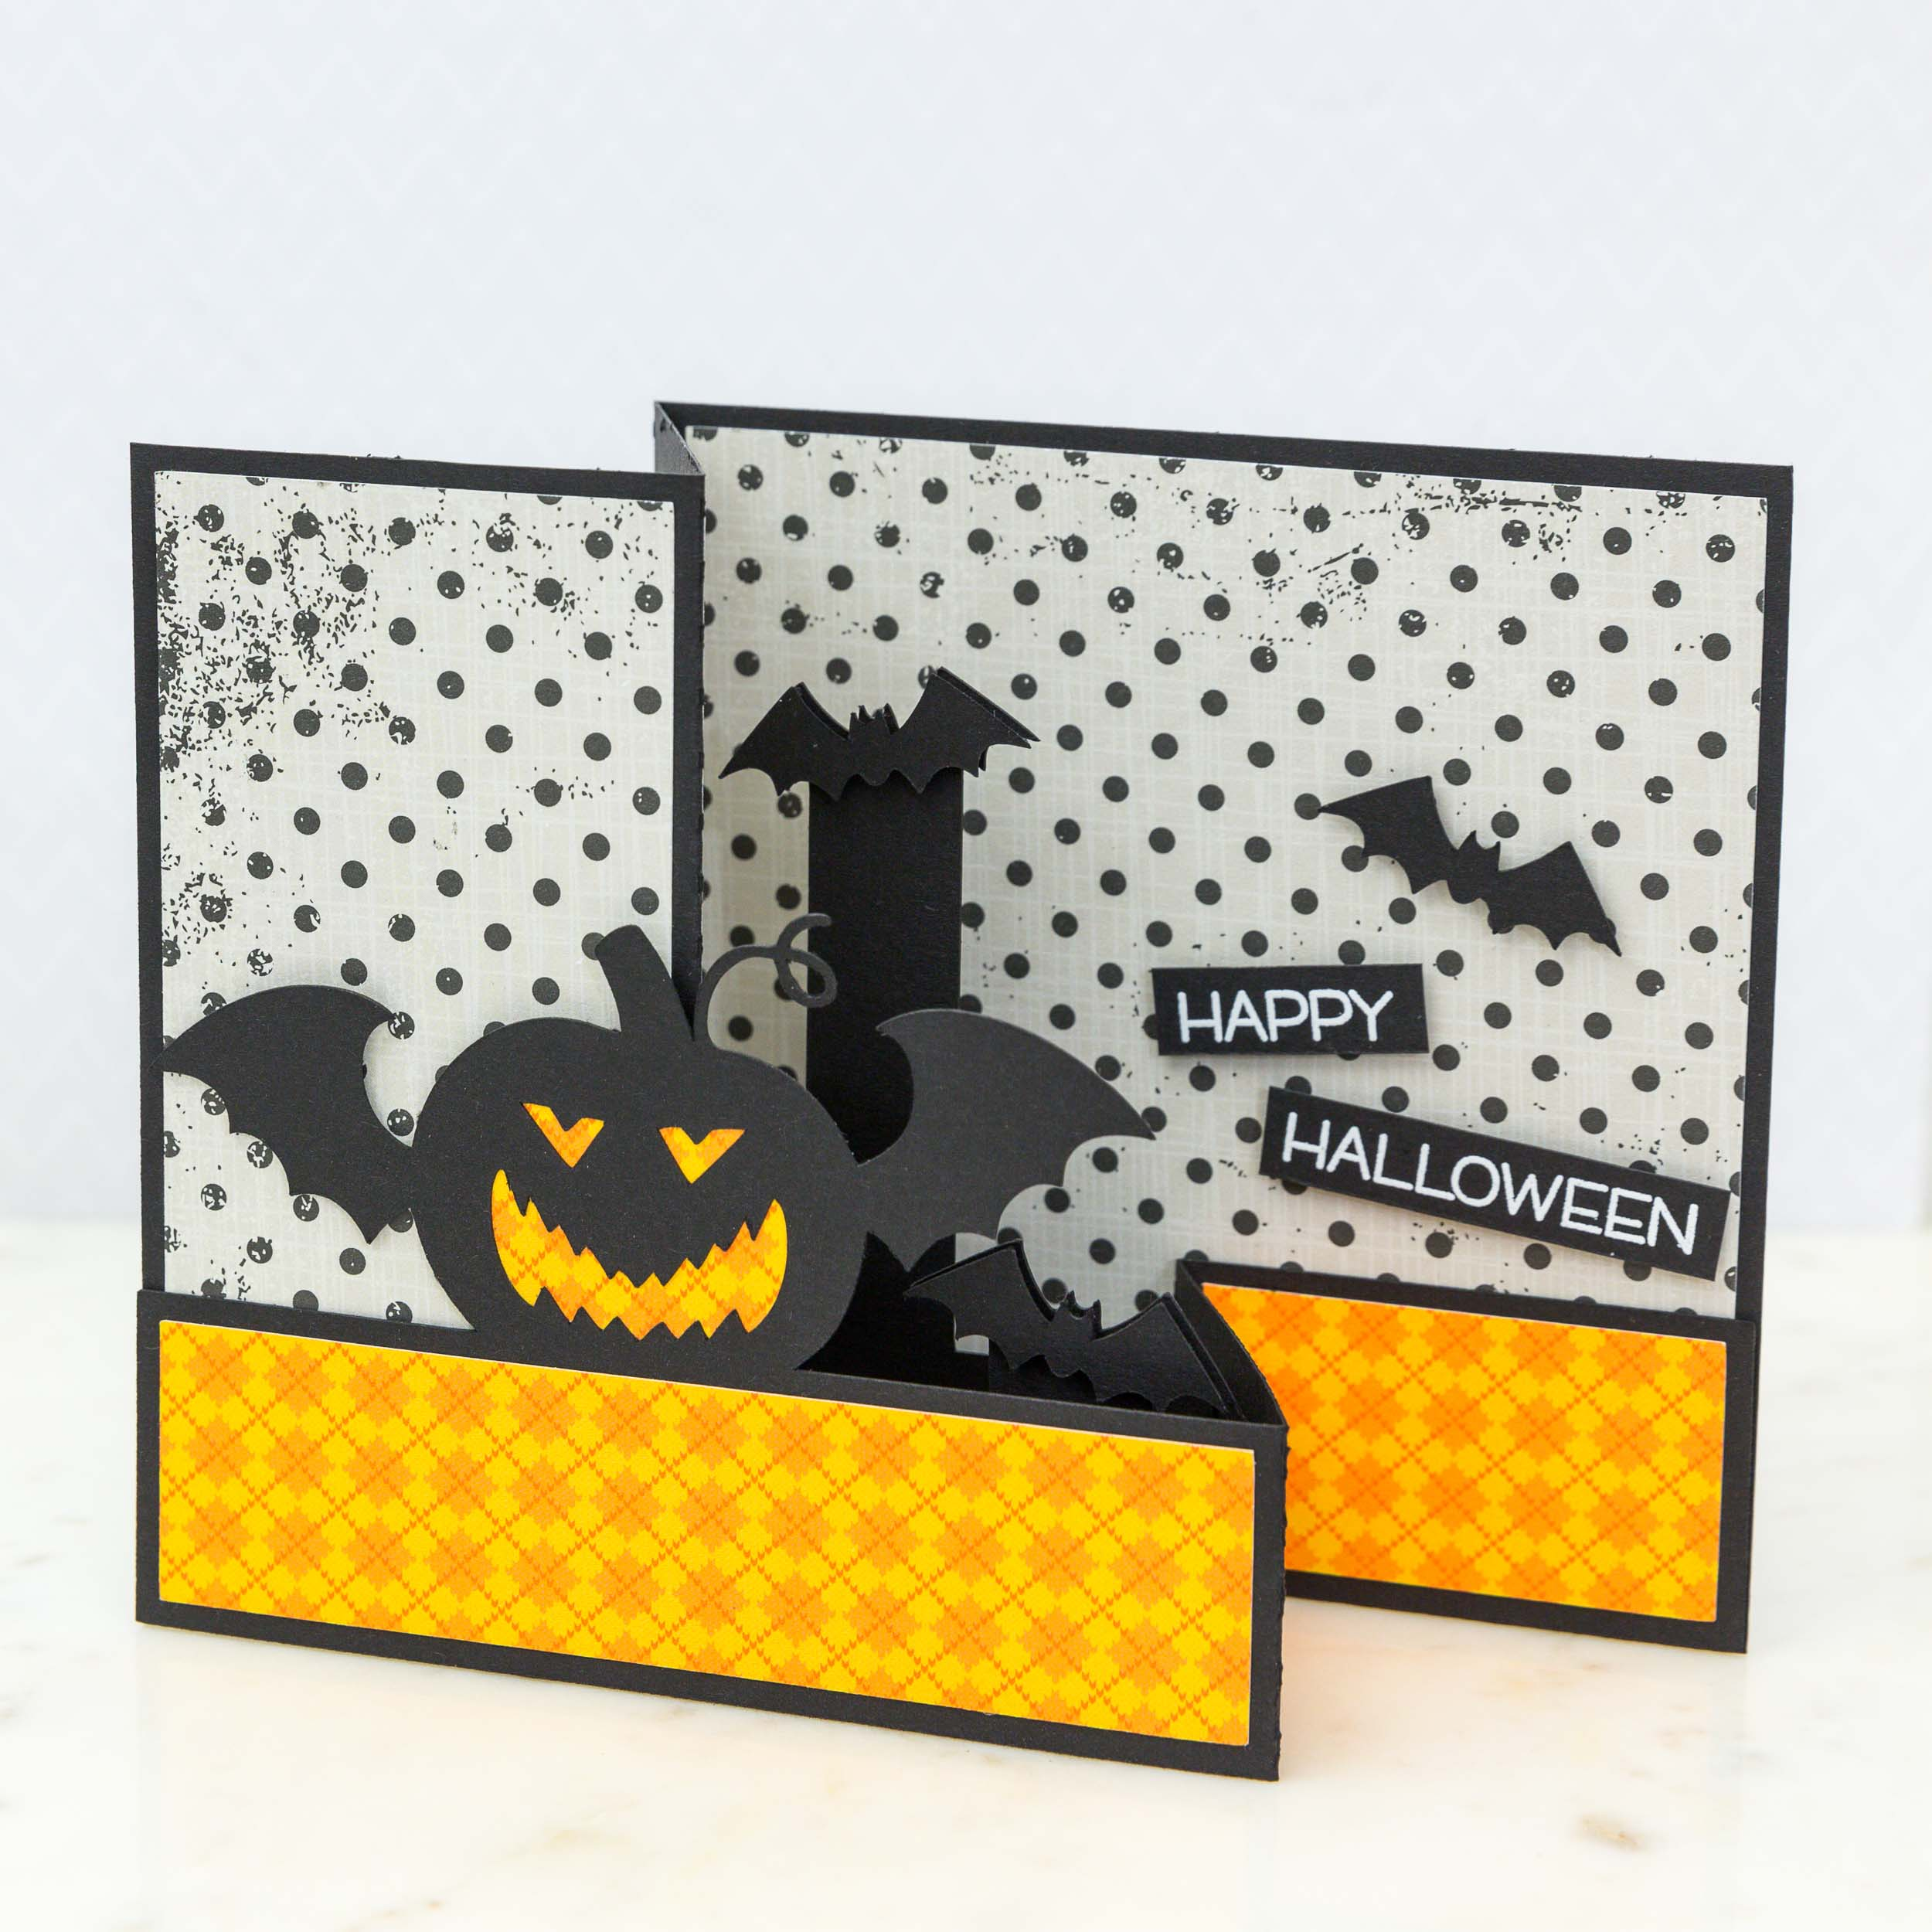 Halloween Card by Mimi Zitrone